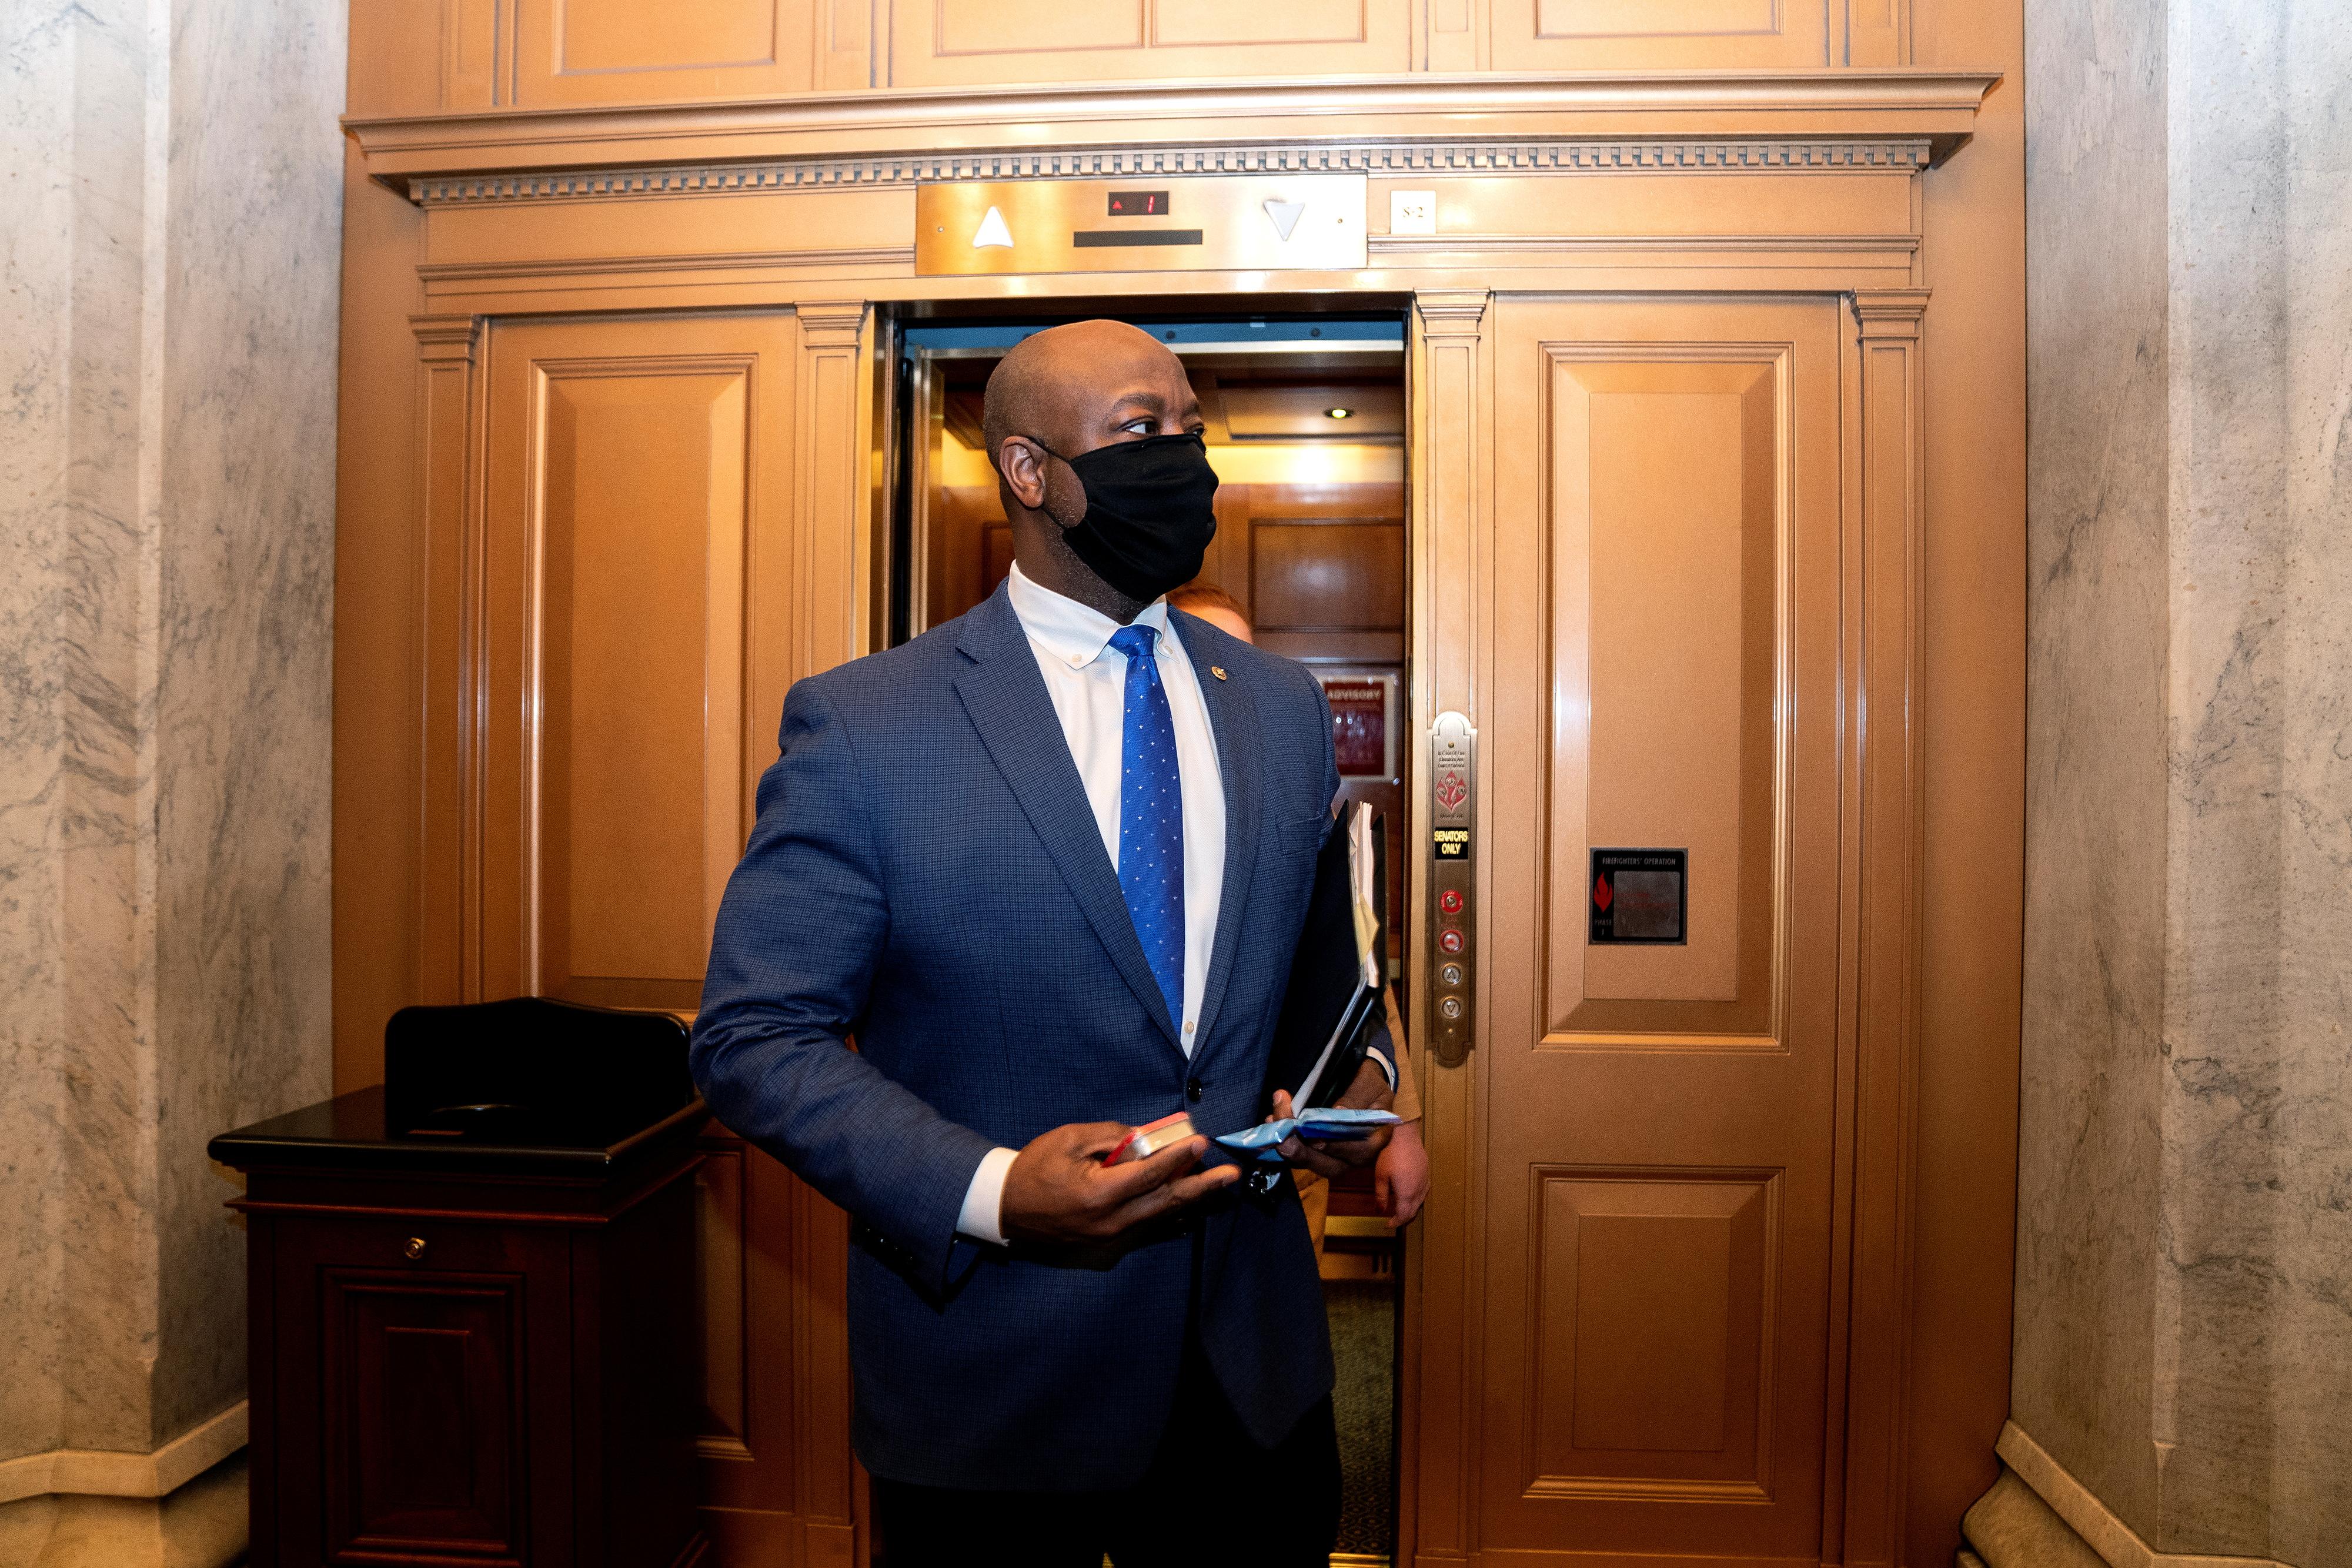 U.S. Senator Tim Scott (R-SC) wears a protective mask while departing the U.S. Capitol in Washington, U.S., February 13, 2021. Stefani Reynolds/Pool via REUTERS